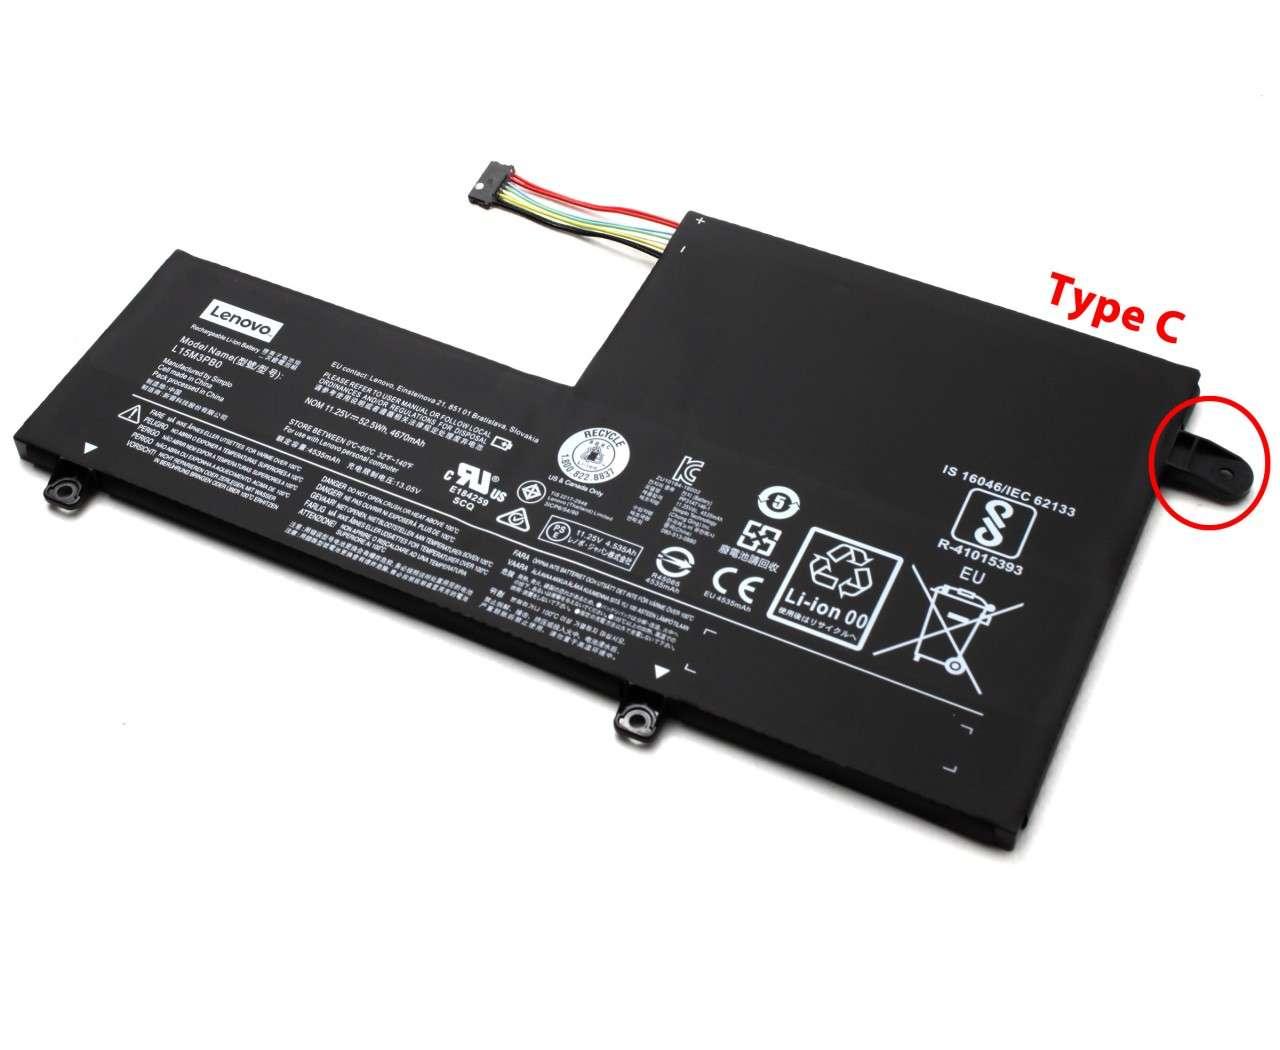 Baterie Lenovo IdeaPad 320S-15AST Originala 52.5Wh Type C imagine powerlaptop.ro 2021